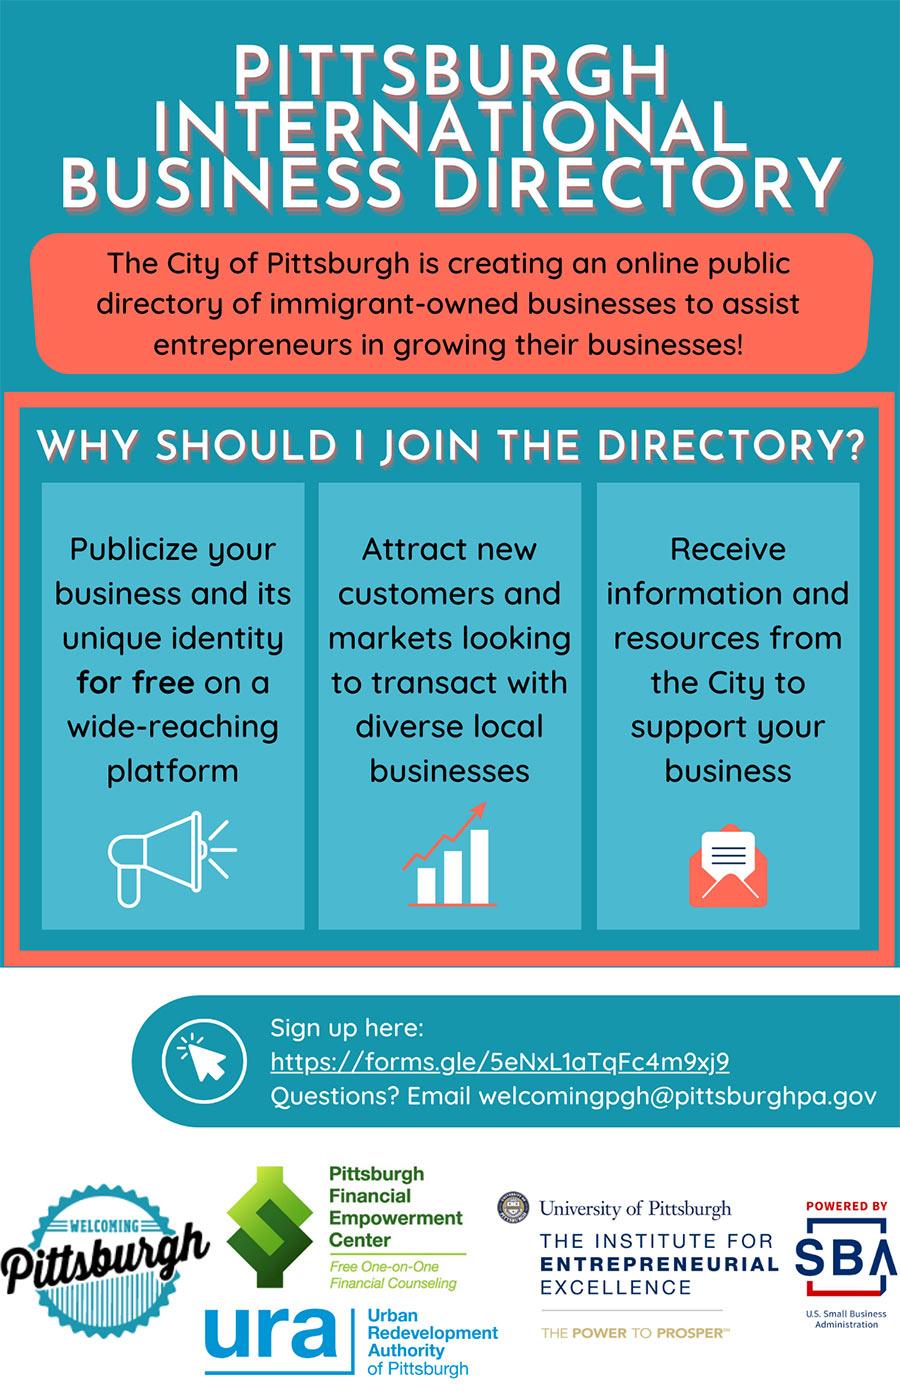 Pittsburgh International Business Directory